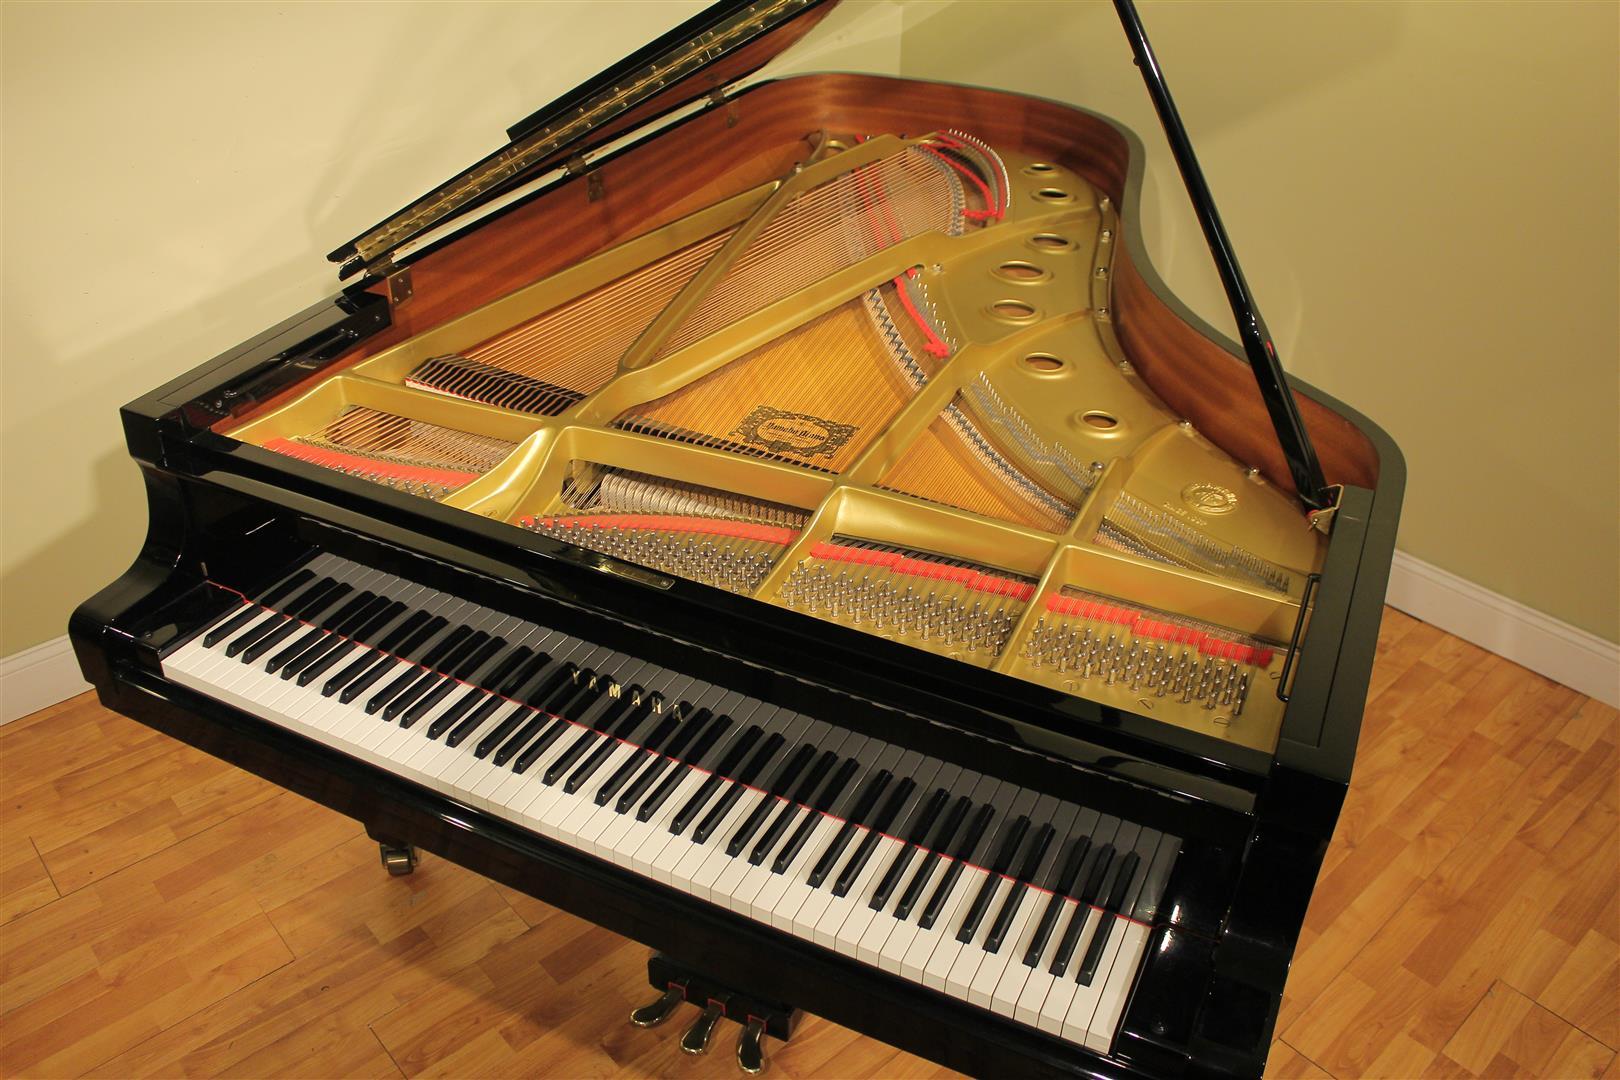 yamaha c7 7 39 6 39 39 semi concert grand piano 1991 ebay. Black Bedroom Furniture Sets. Home Design Ideas